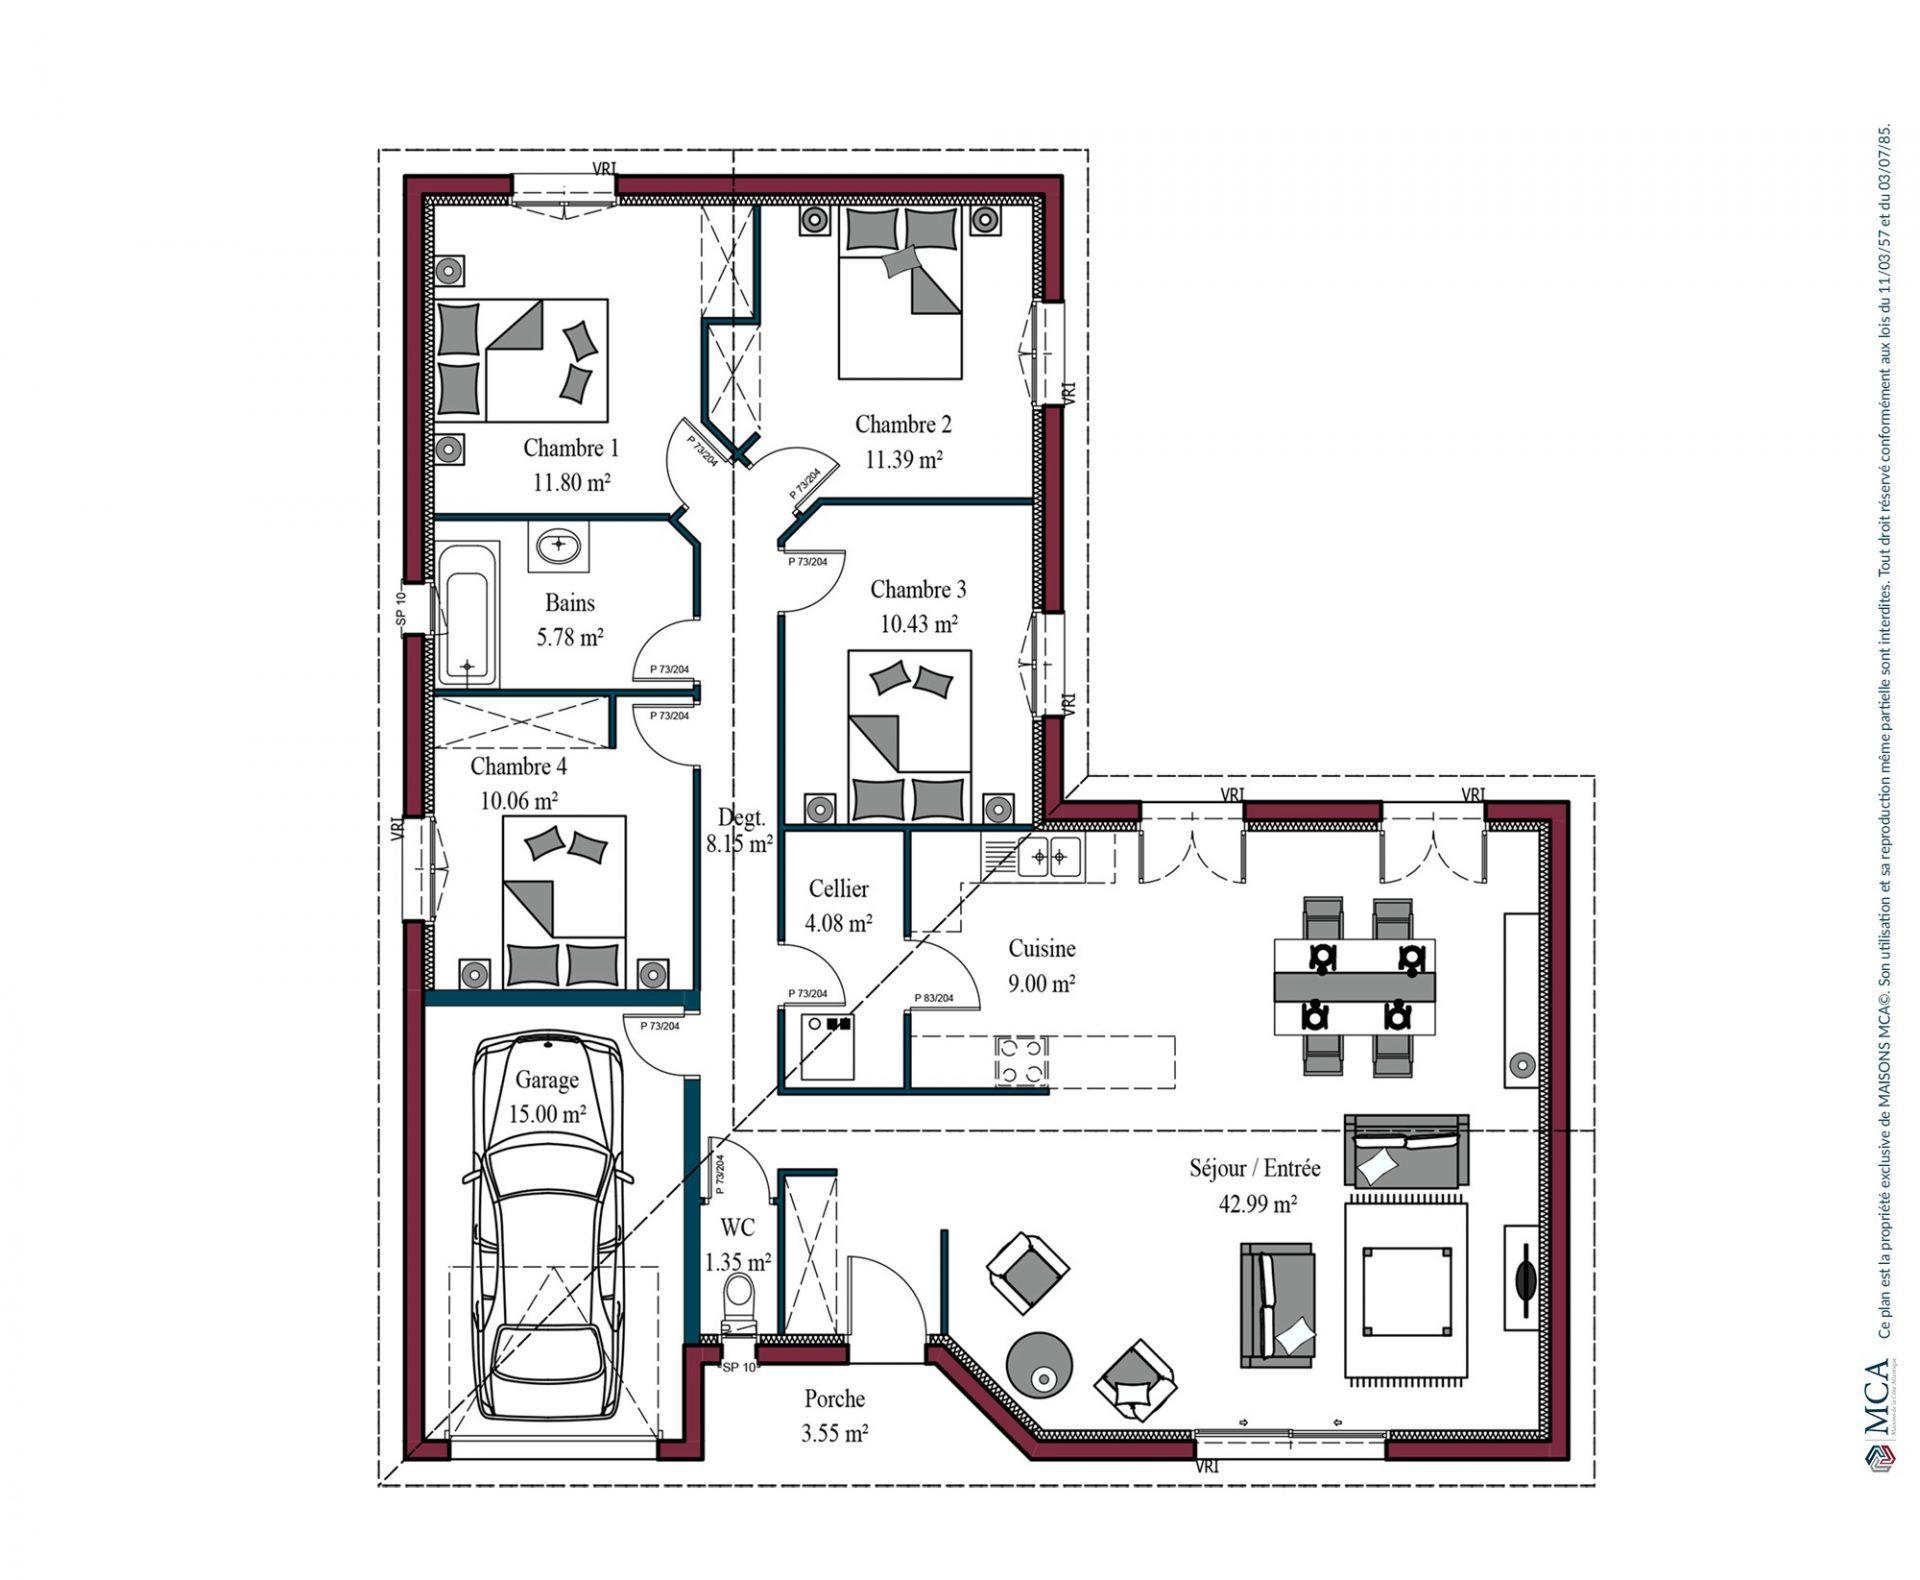 Plan Atlanta | 115 m²